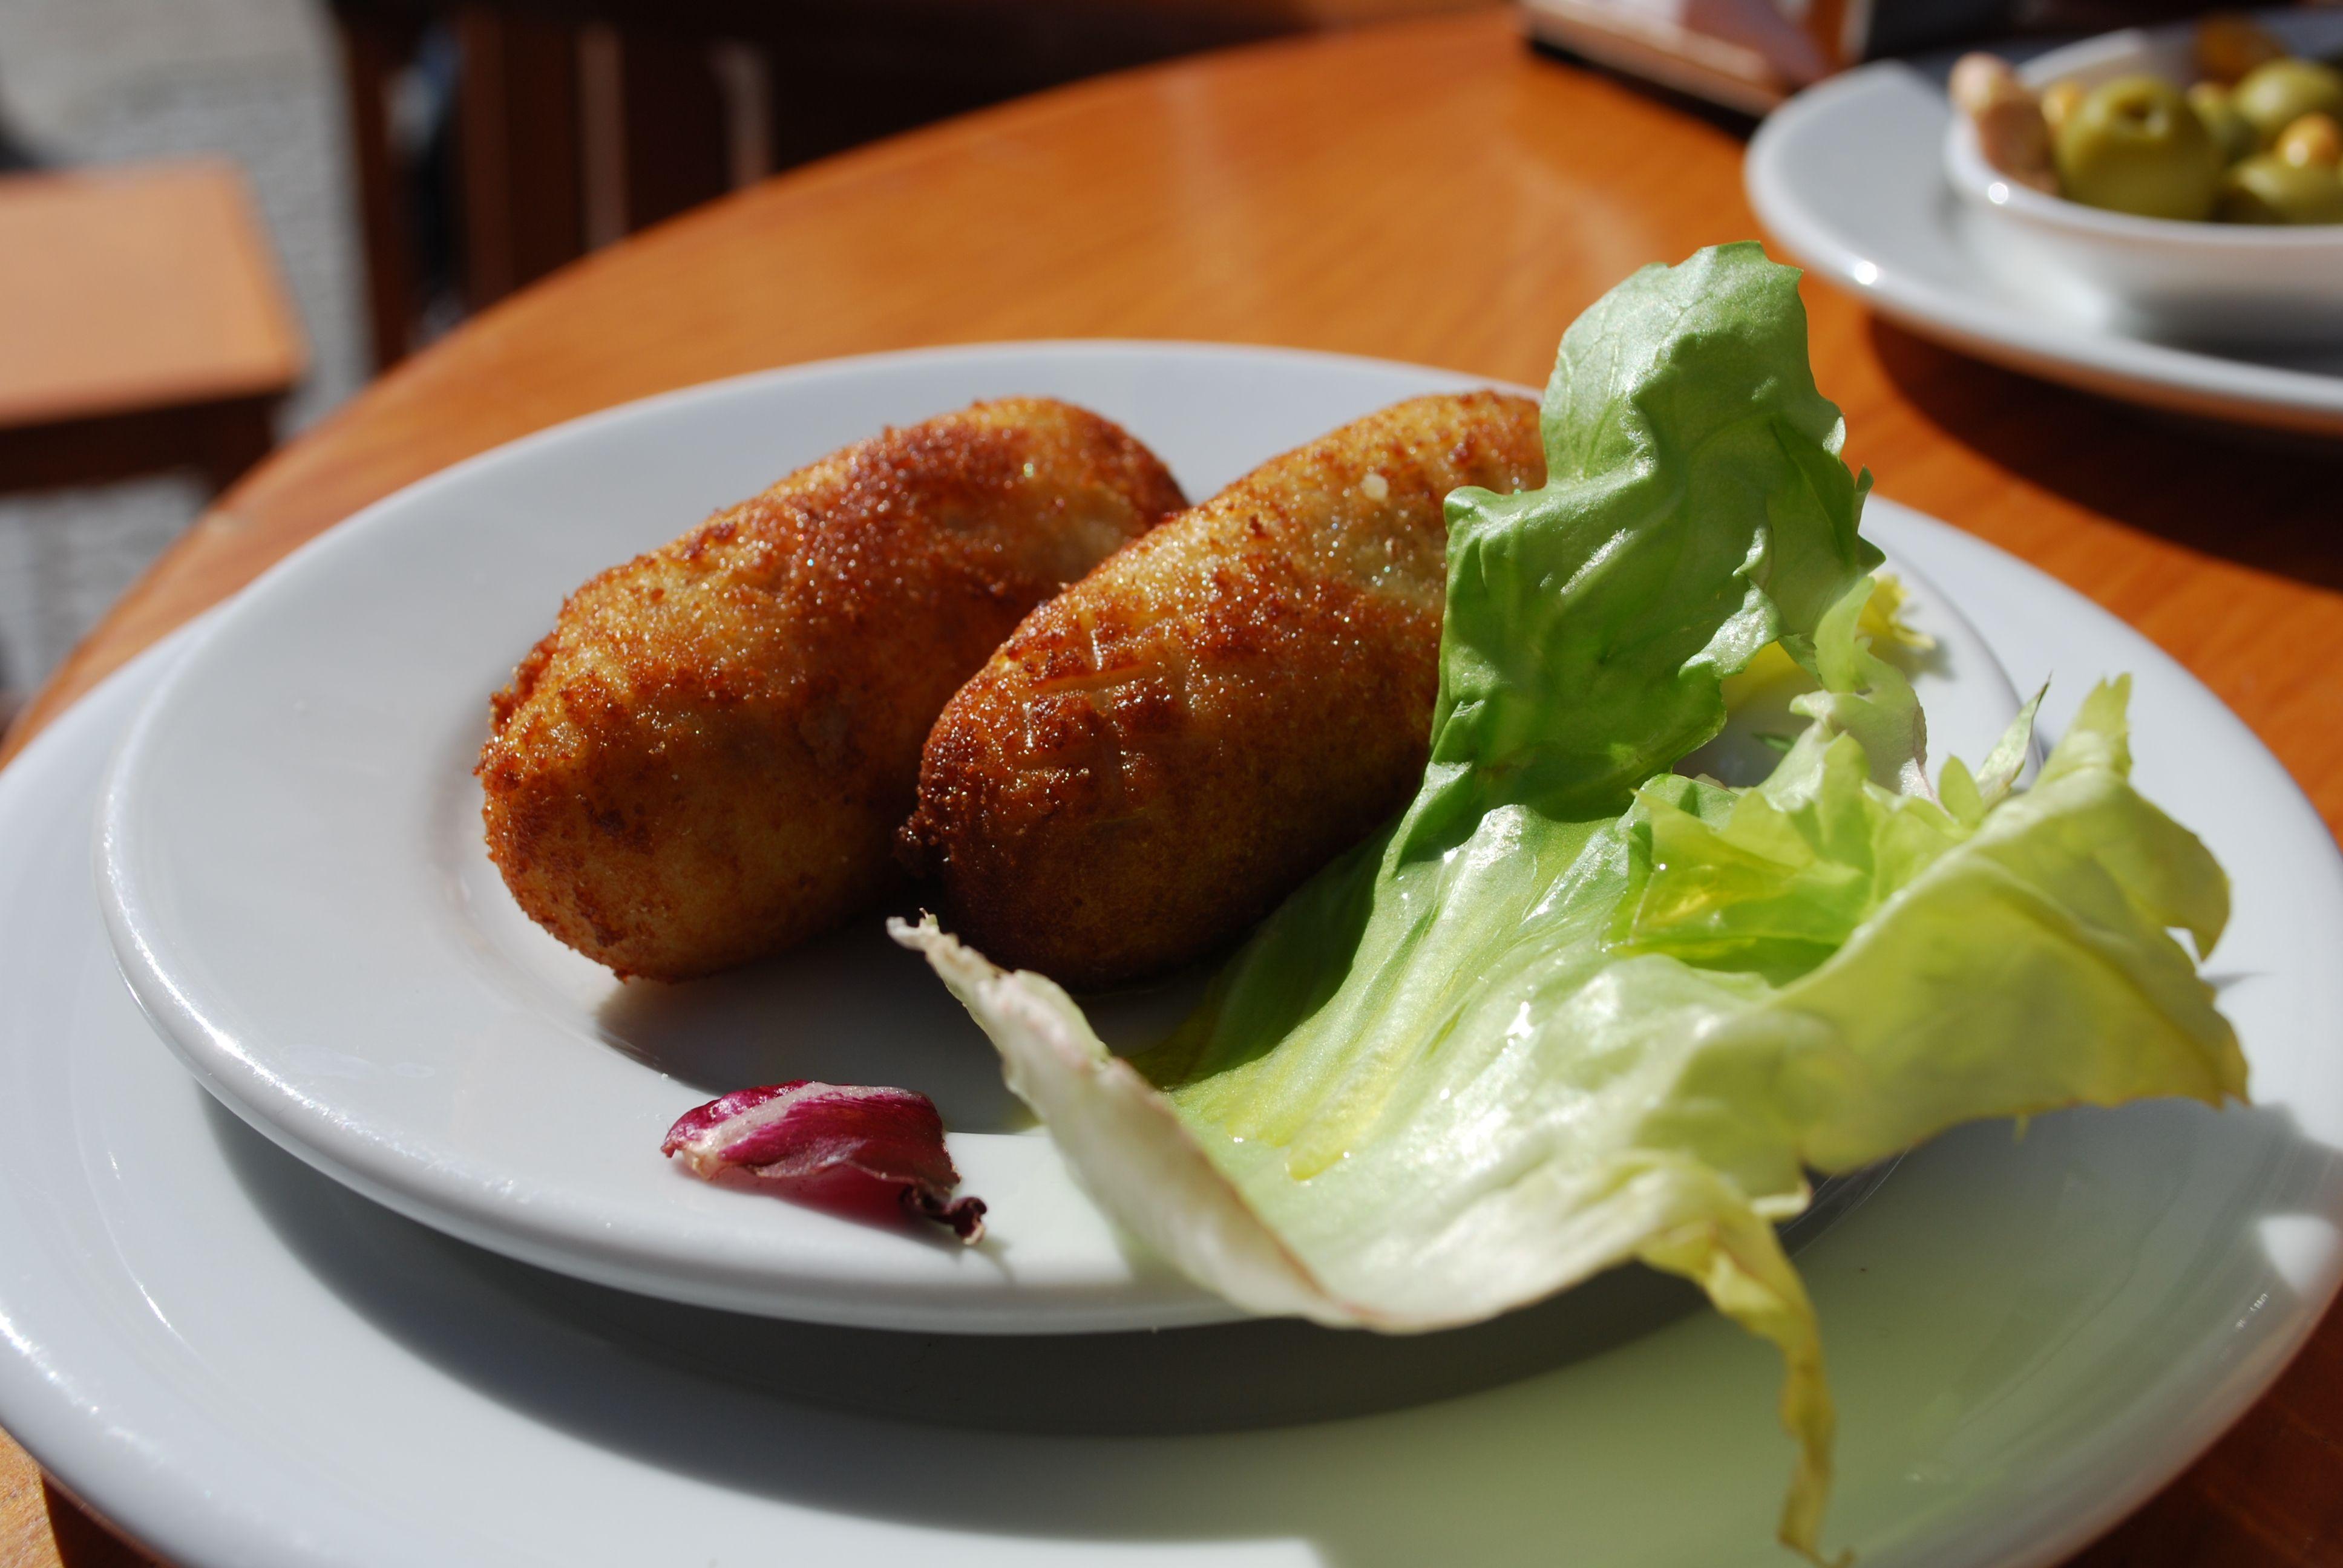 Croquetas! A Spanish classic. | Traditional Spanish Food ...  Croquetas! A Sp...